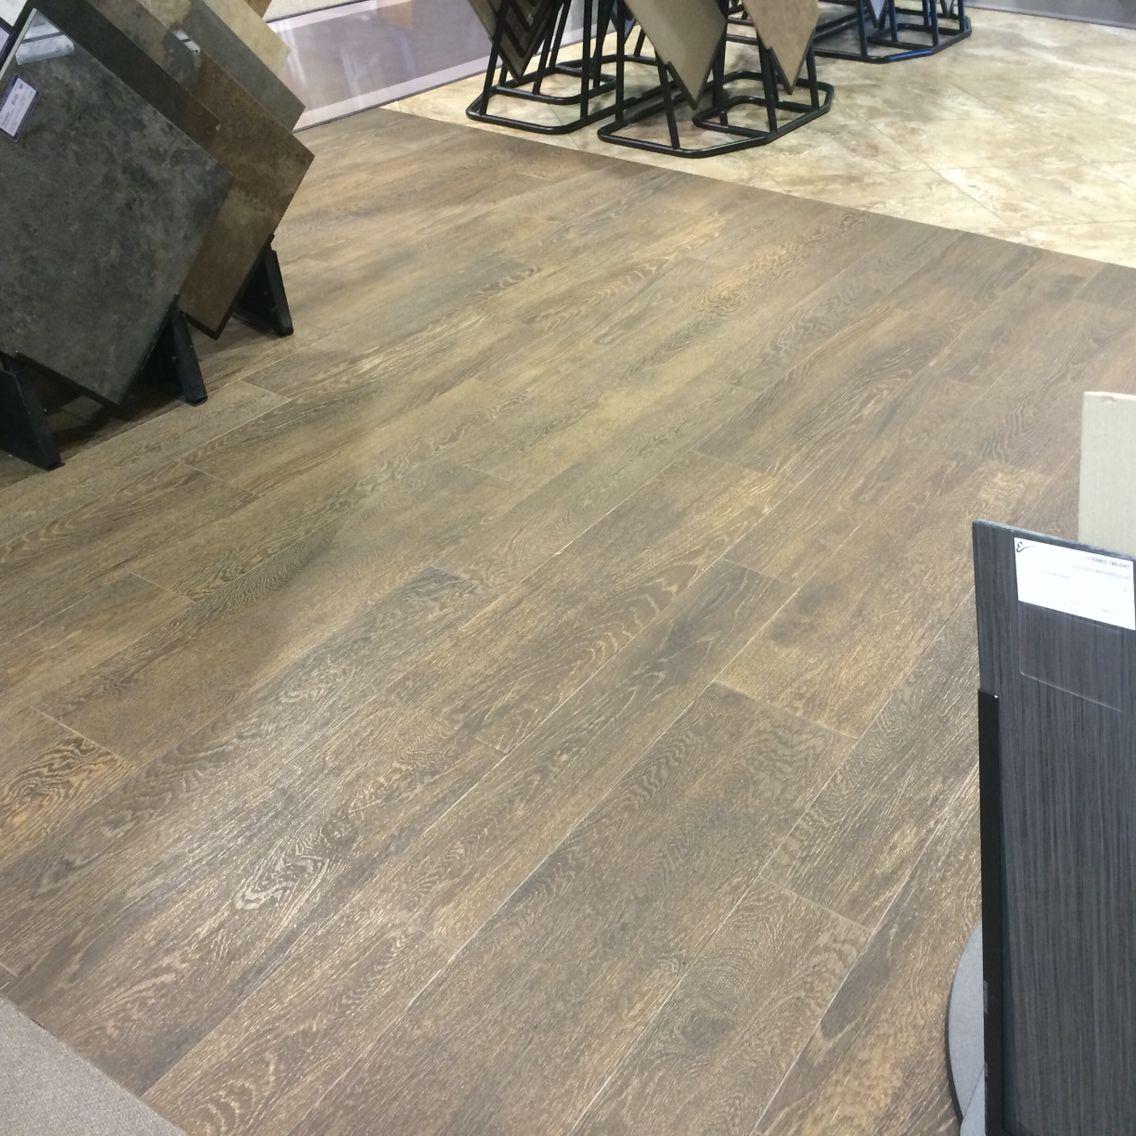 Ragno Cambridge Oak In Brown Tile That Looks Exactly Like